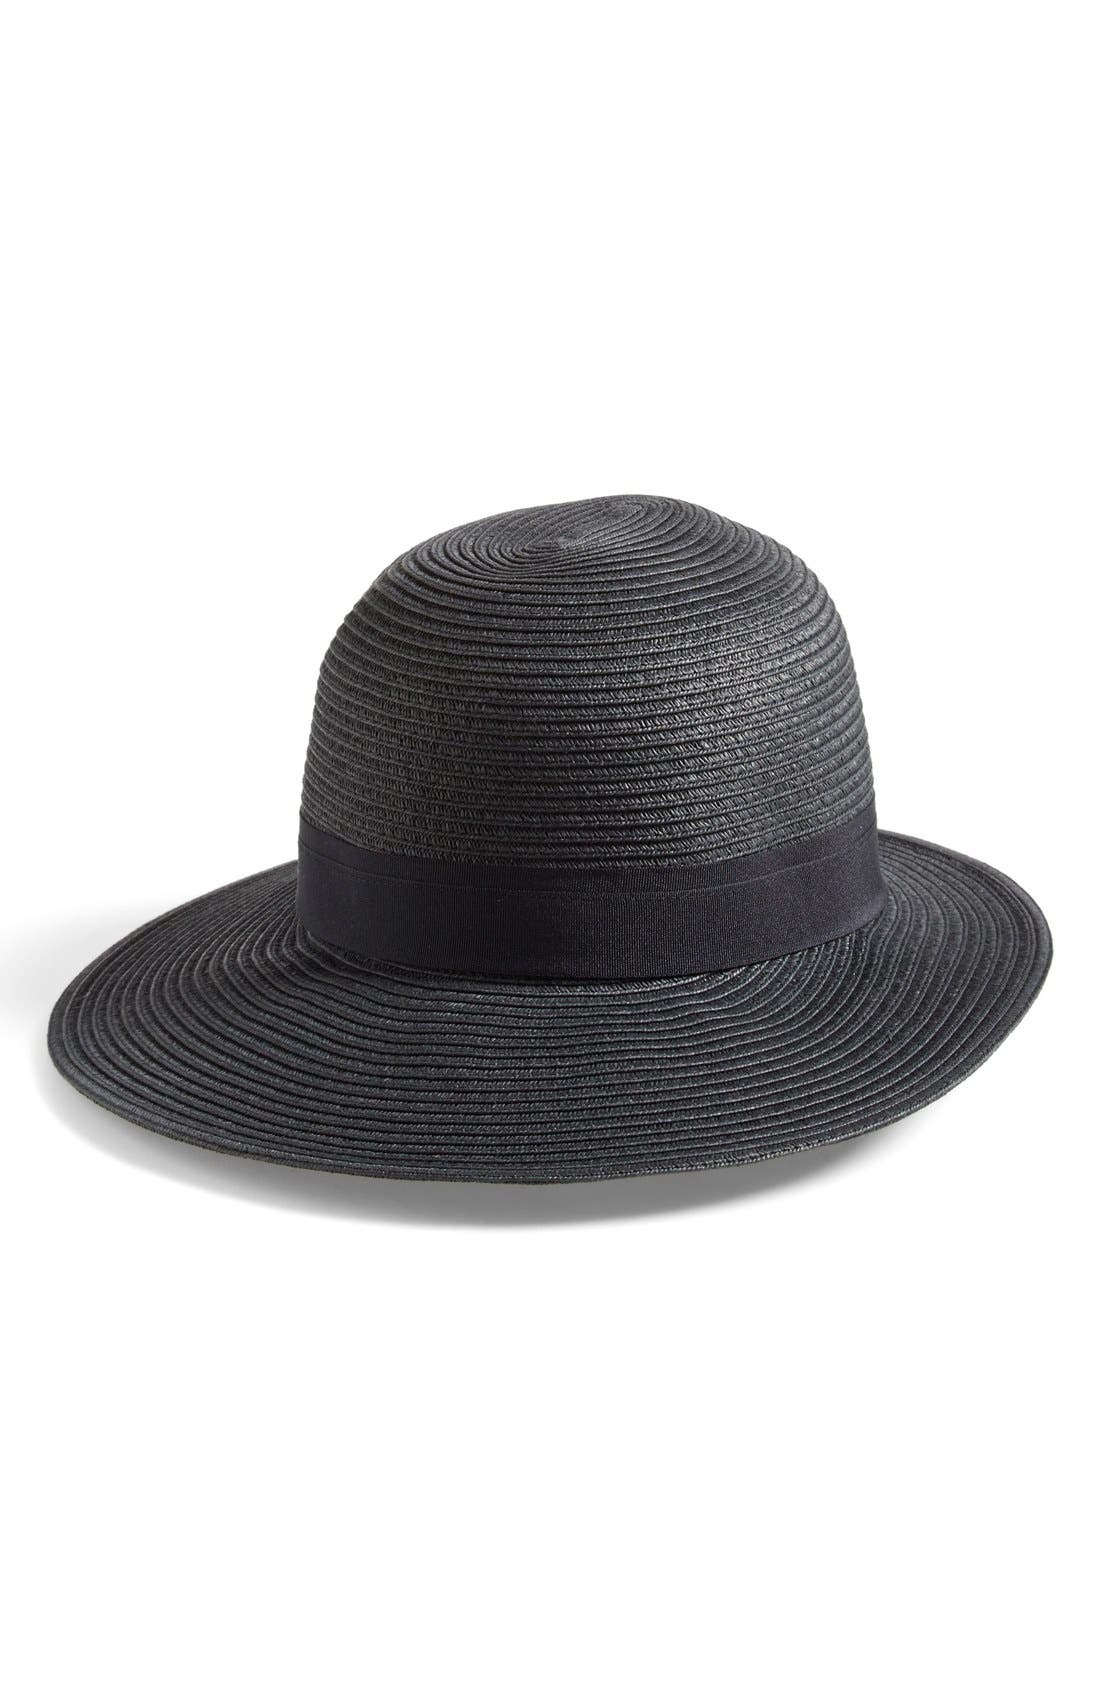 Asymmetrical Brim Floppy Hat,                         Main,                         color, 001